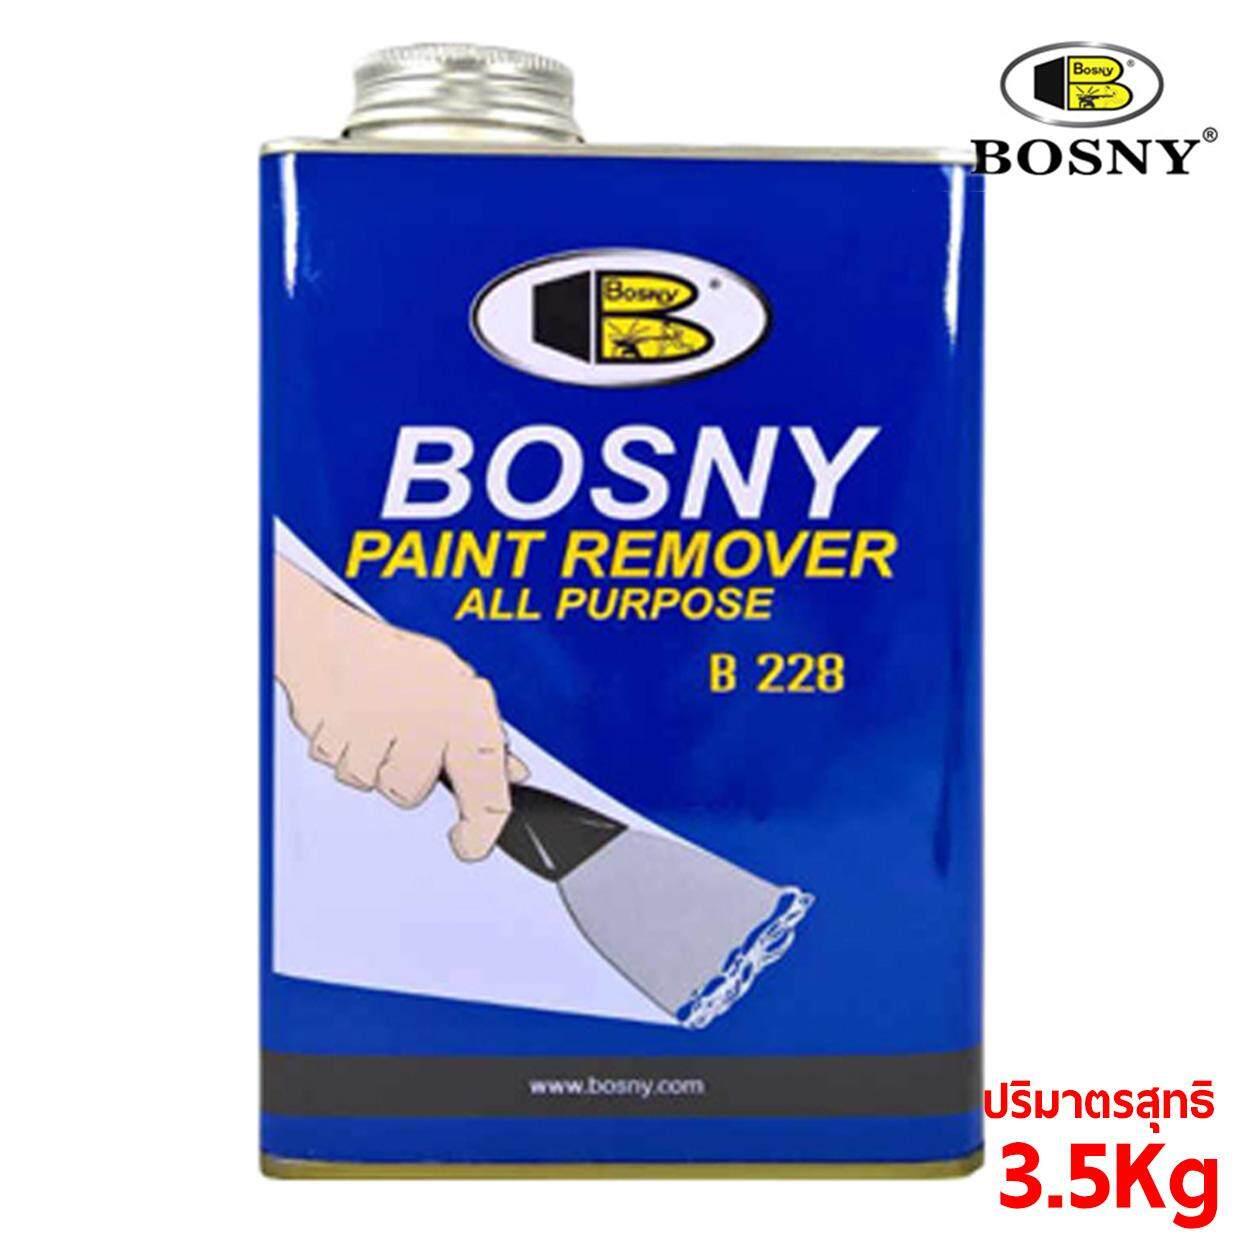 BOSNY น้ำยาลอกสี PAINT REMOVER ขนาด 3.5kg.